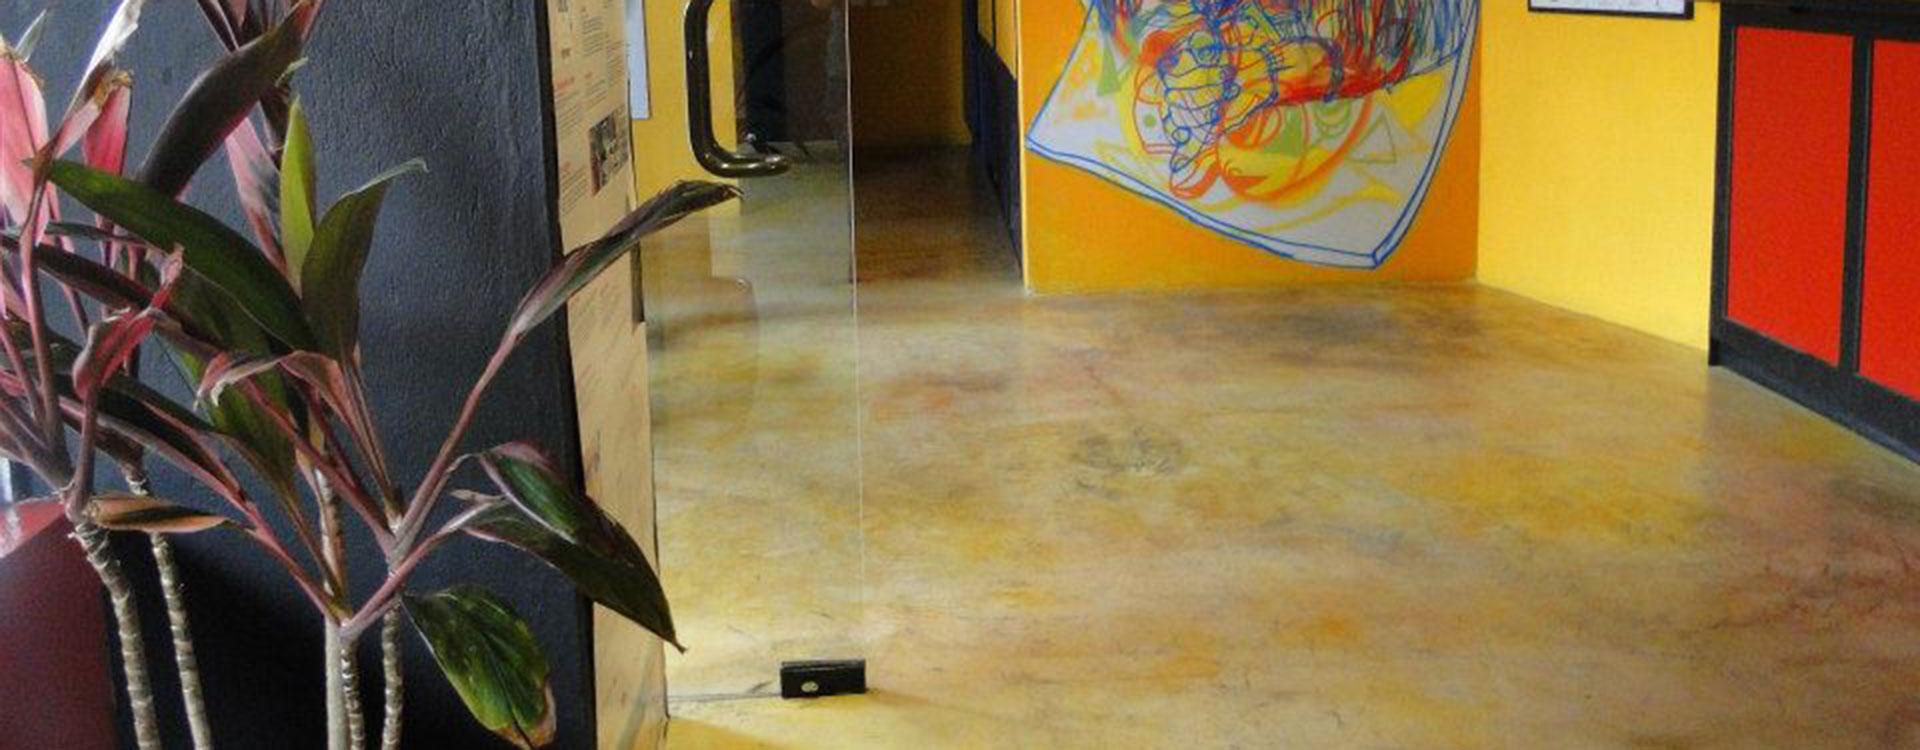 Pisos de concreto decorativo concretarte quito ecuador for Cemento pulido exterior